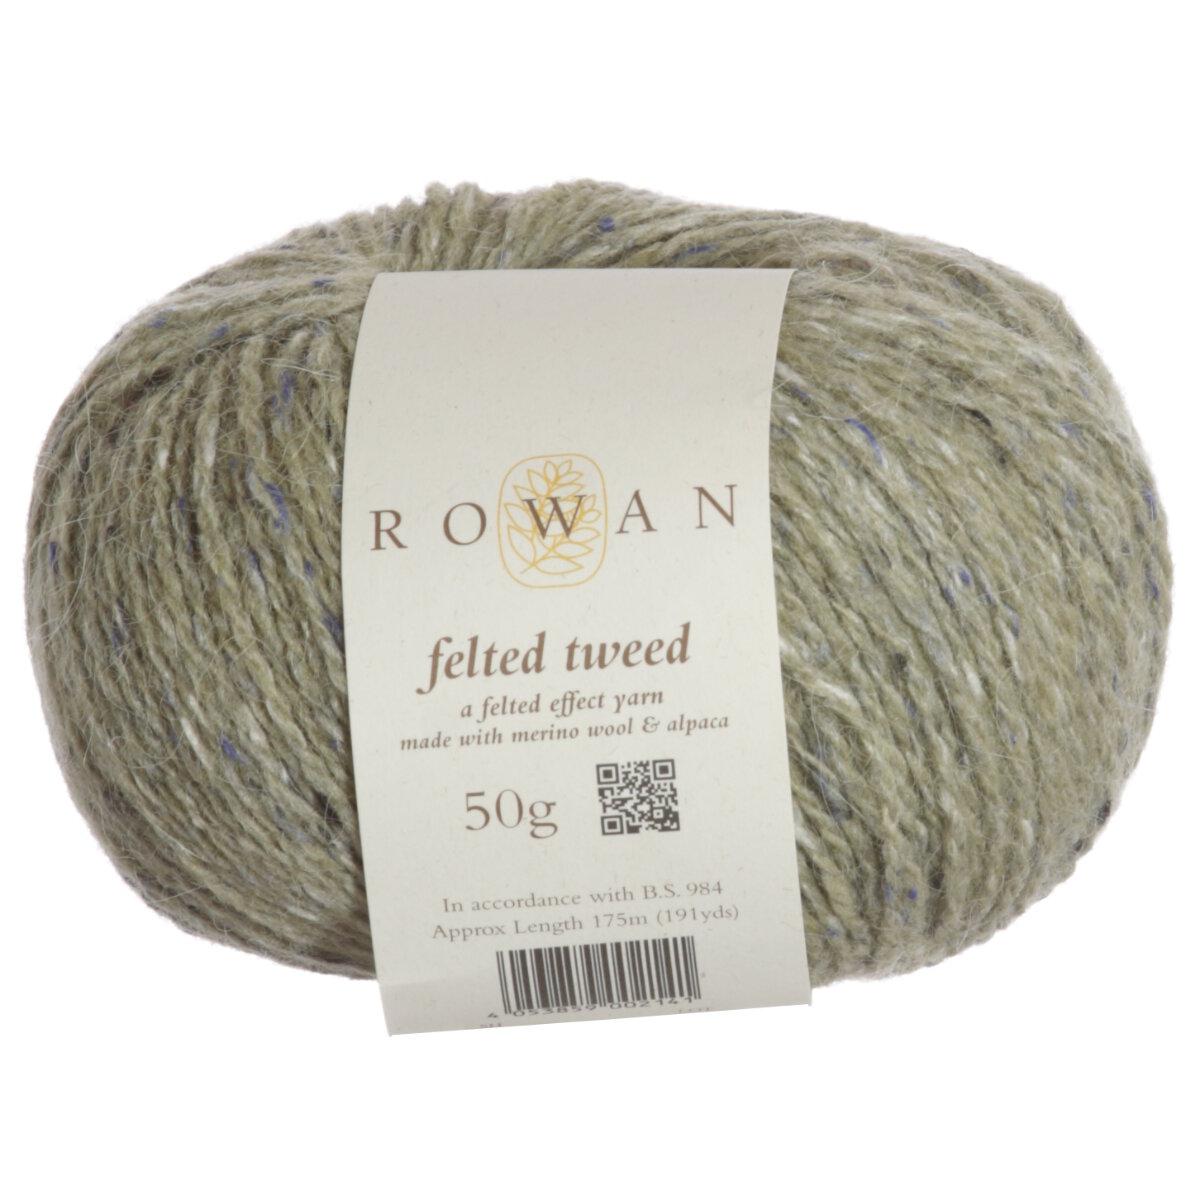 Rowan Felted Tweed Yarn 190 Stone At Jimmy Beans Wool